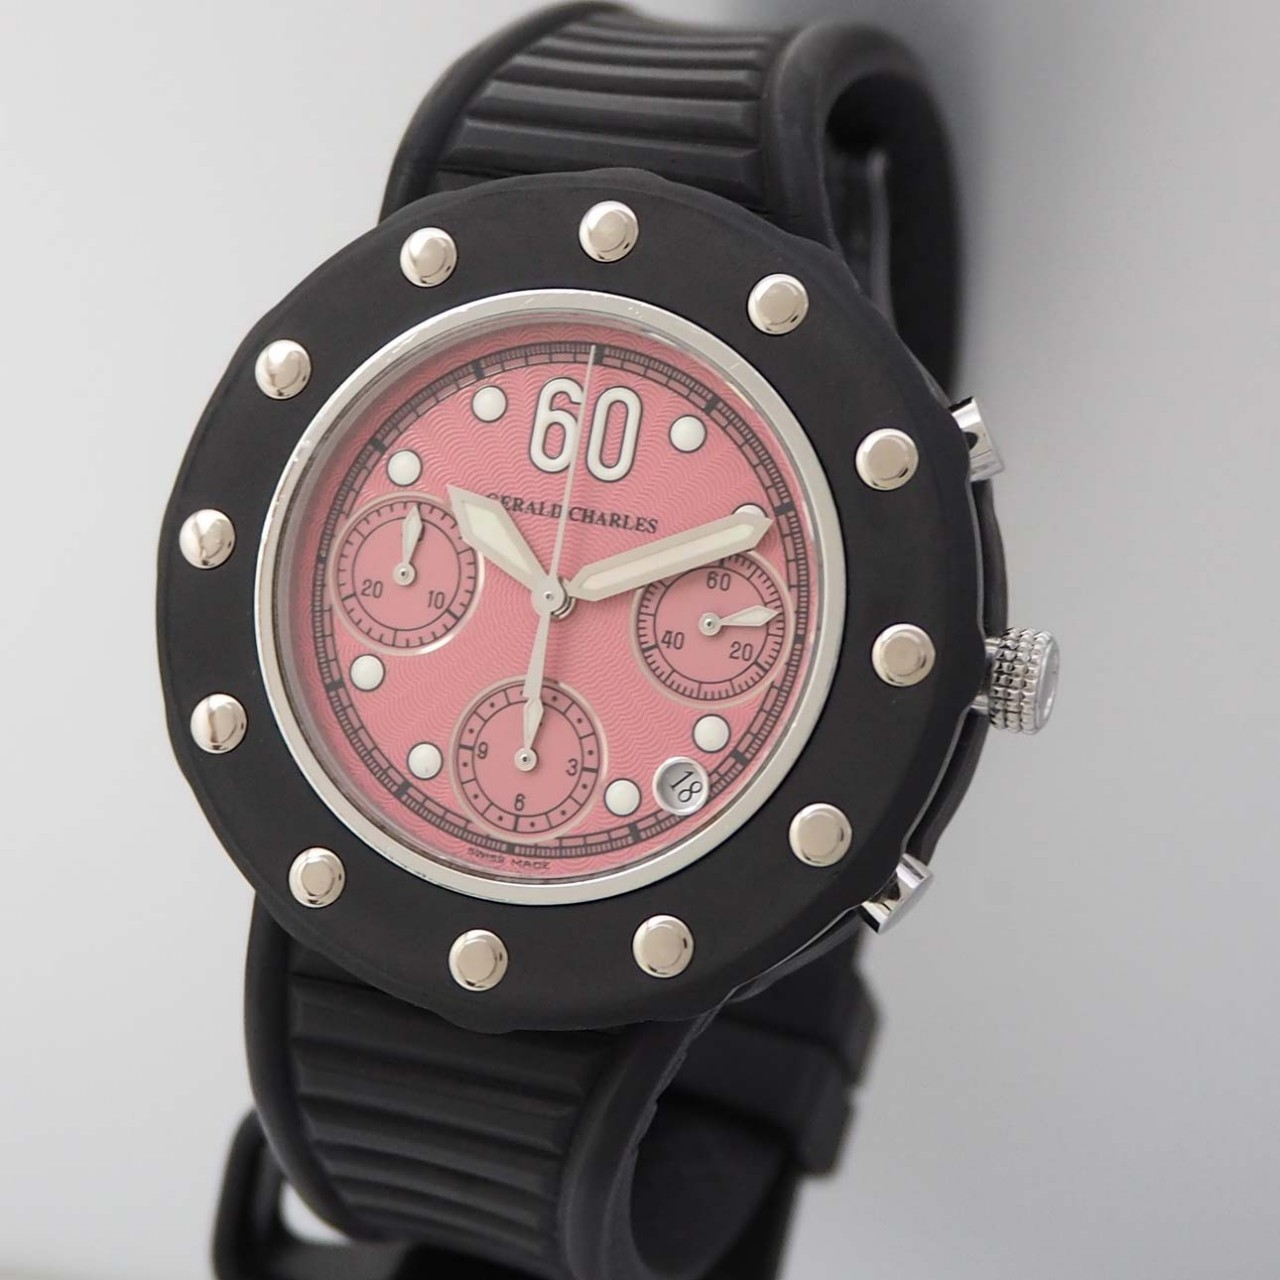 Gerald Charles/ Genta GC9 Seaside Chronograph Stahl/Kautschuk Automatik